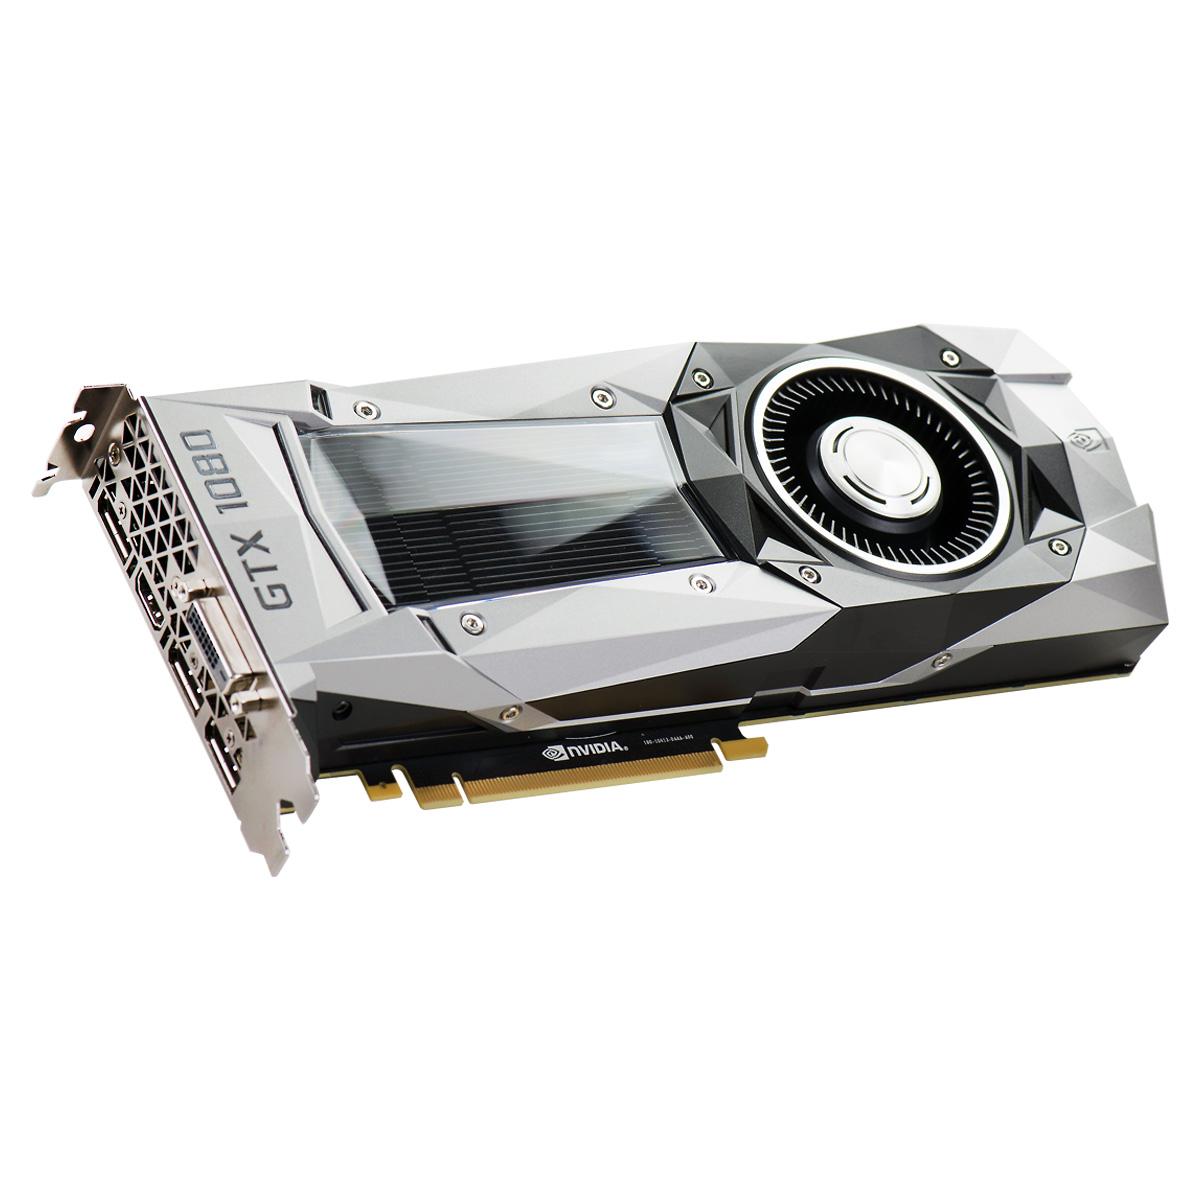 Placa de Vídeo GeForce GTX 1080 8GB Evga DDR5X Pci-e 256 Bits 08G-P4-6180-KR Founders Edition